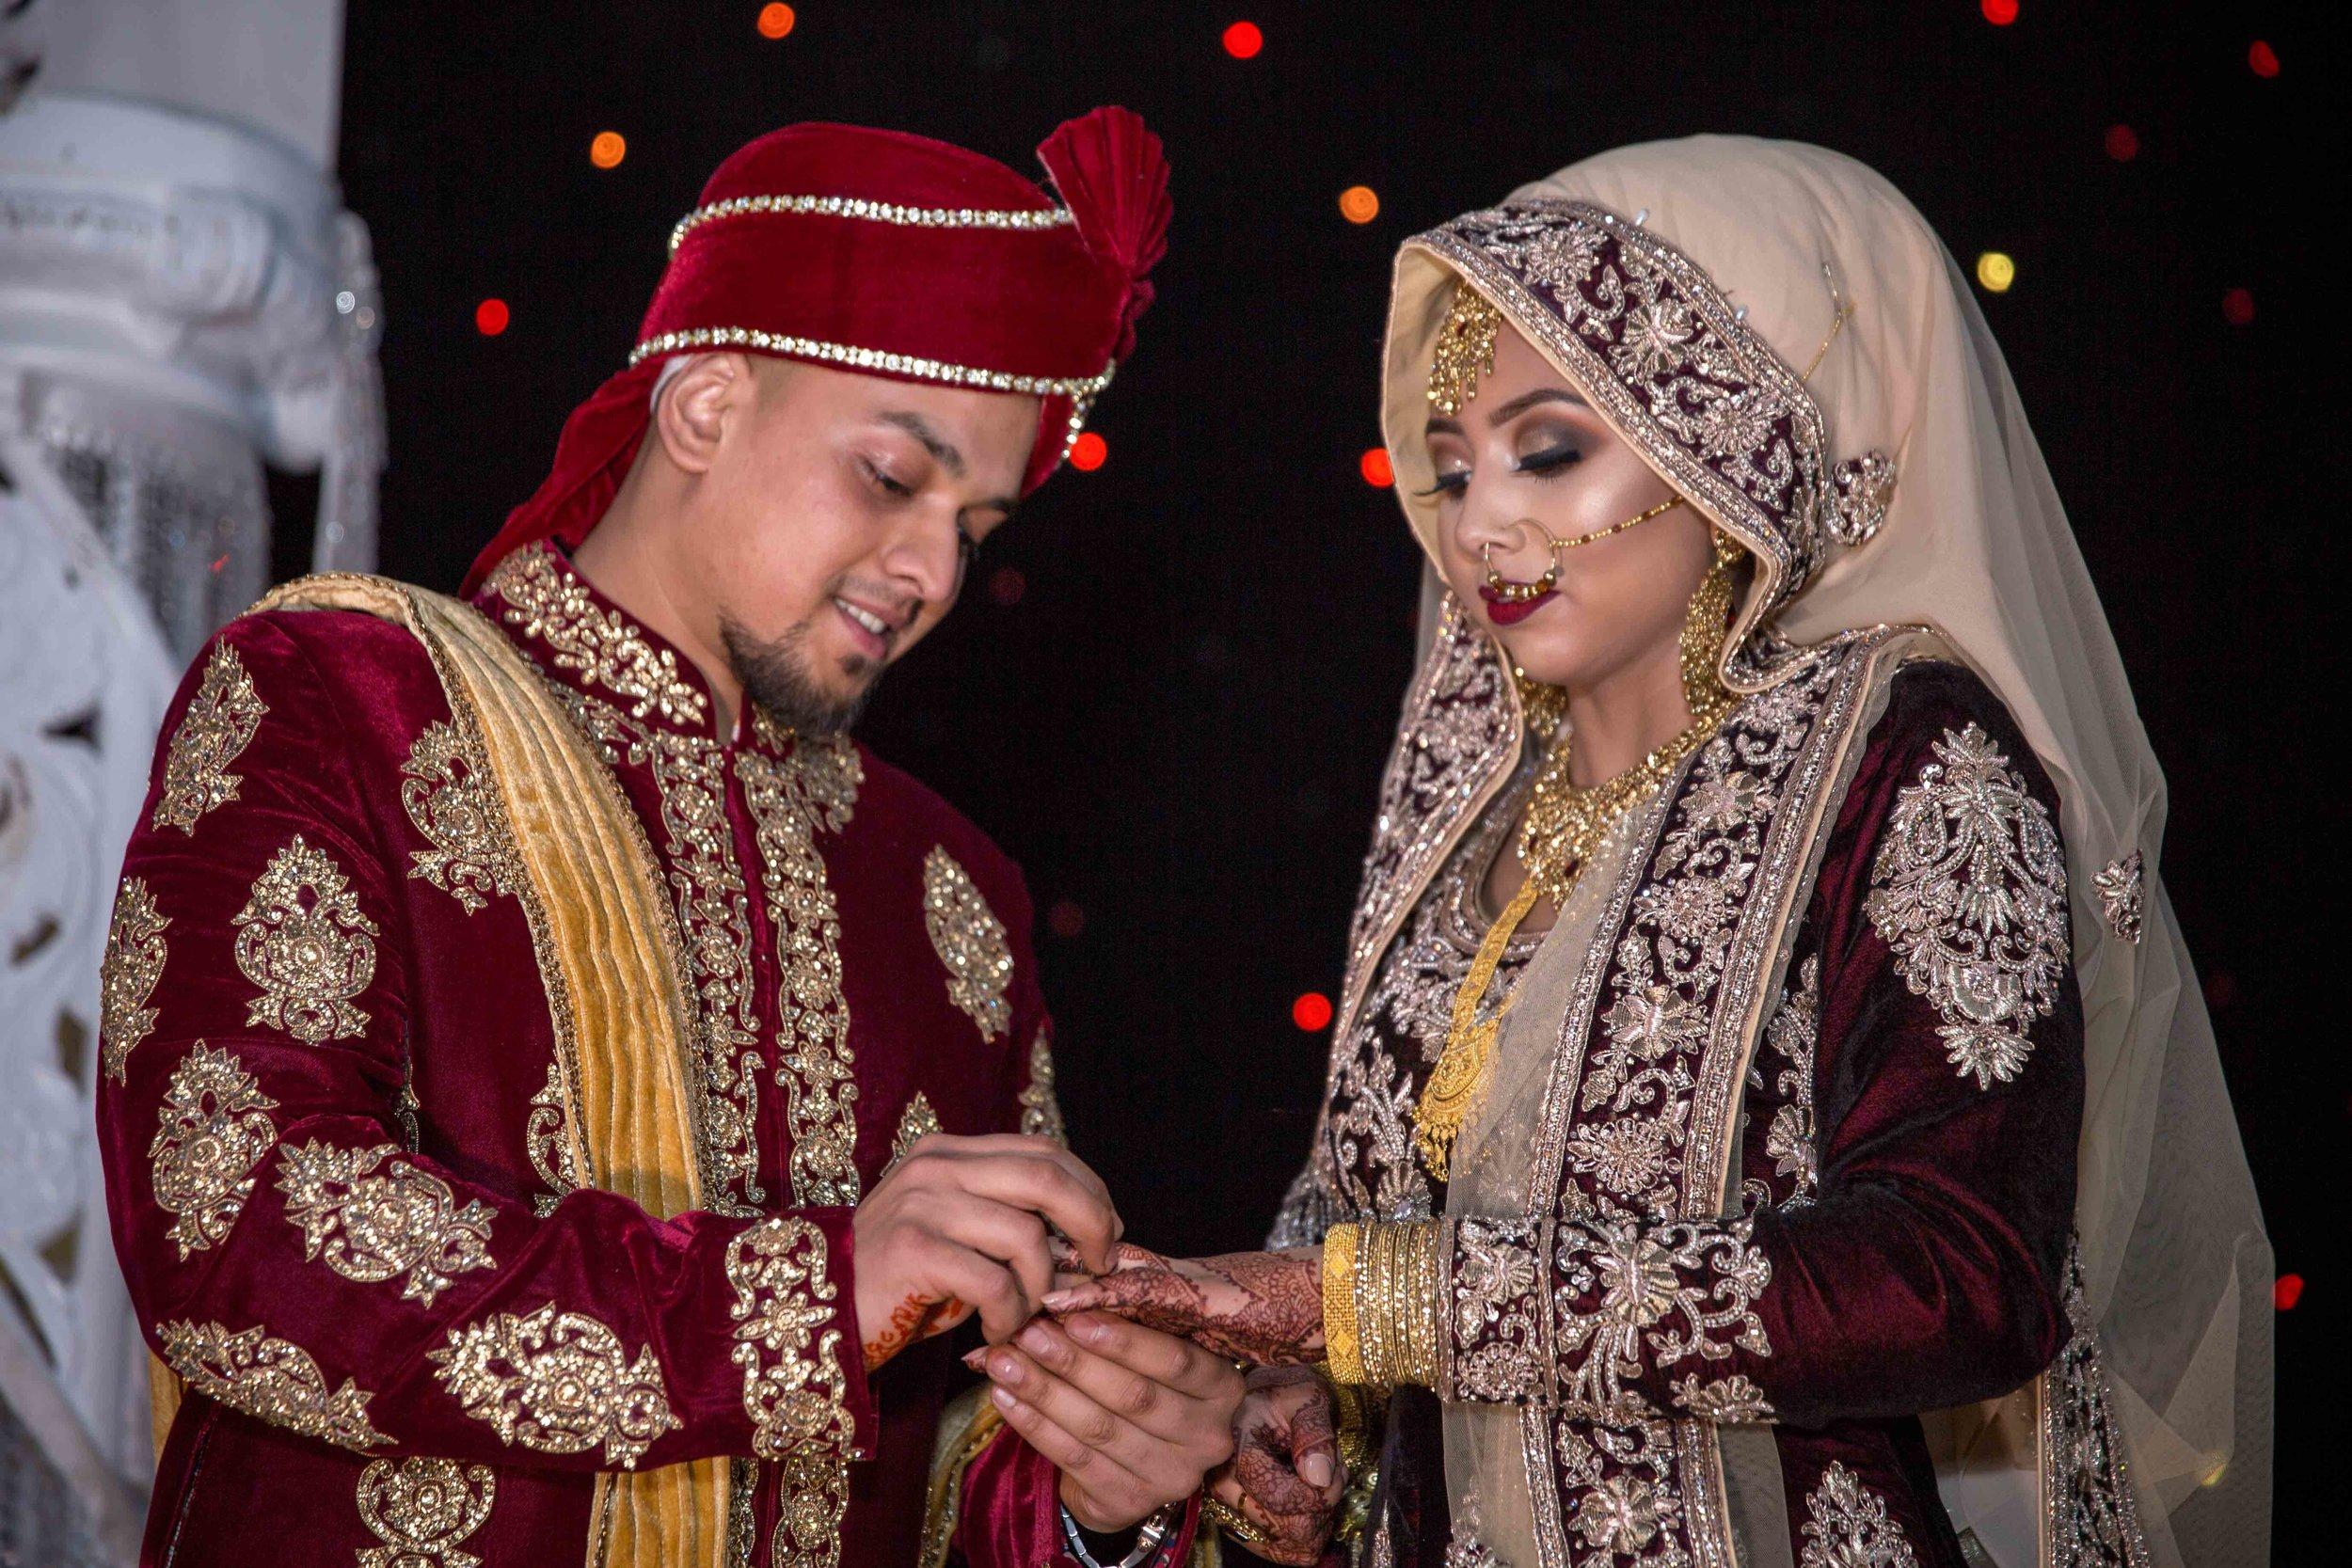 Female-Asian-Piccadilly-banqueting-suite-Wedding-Photographer-Birmingham-natalia-smith-photography-27.jpg